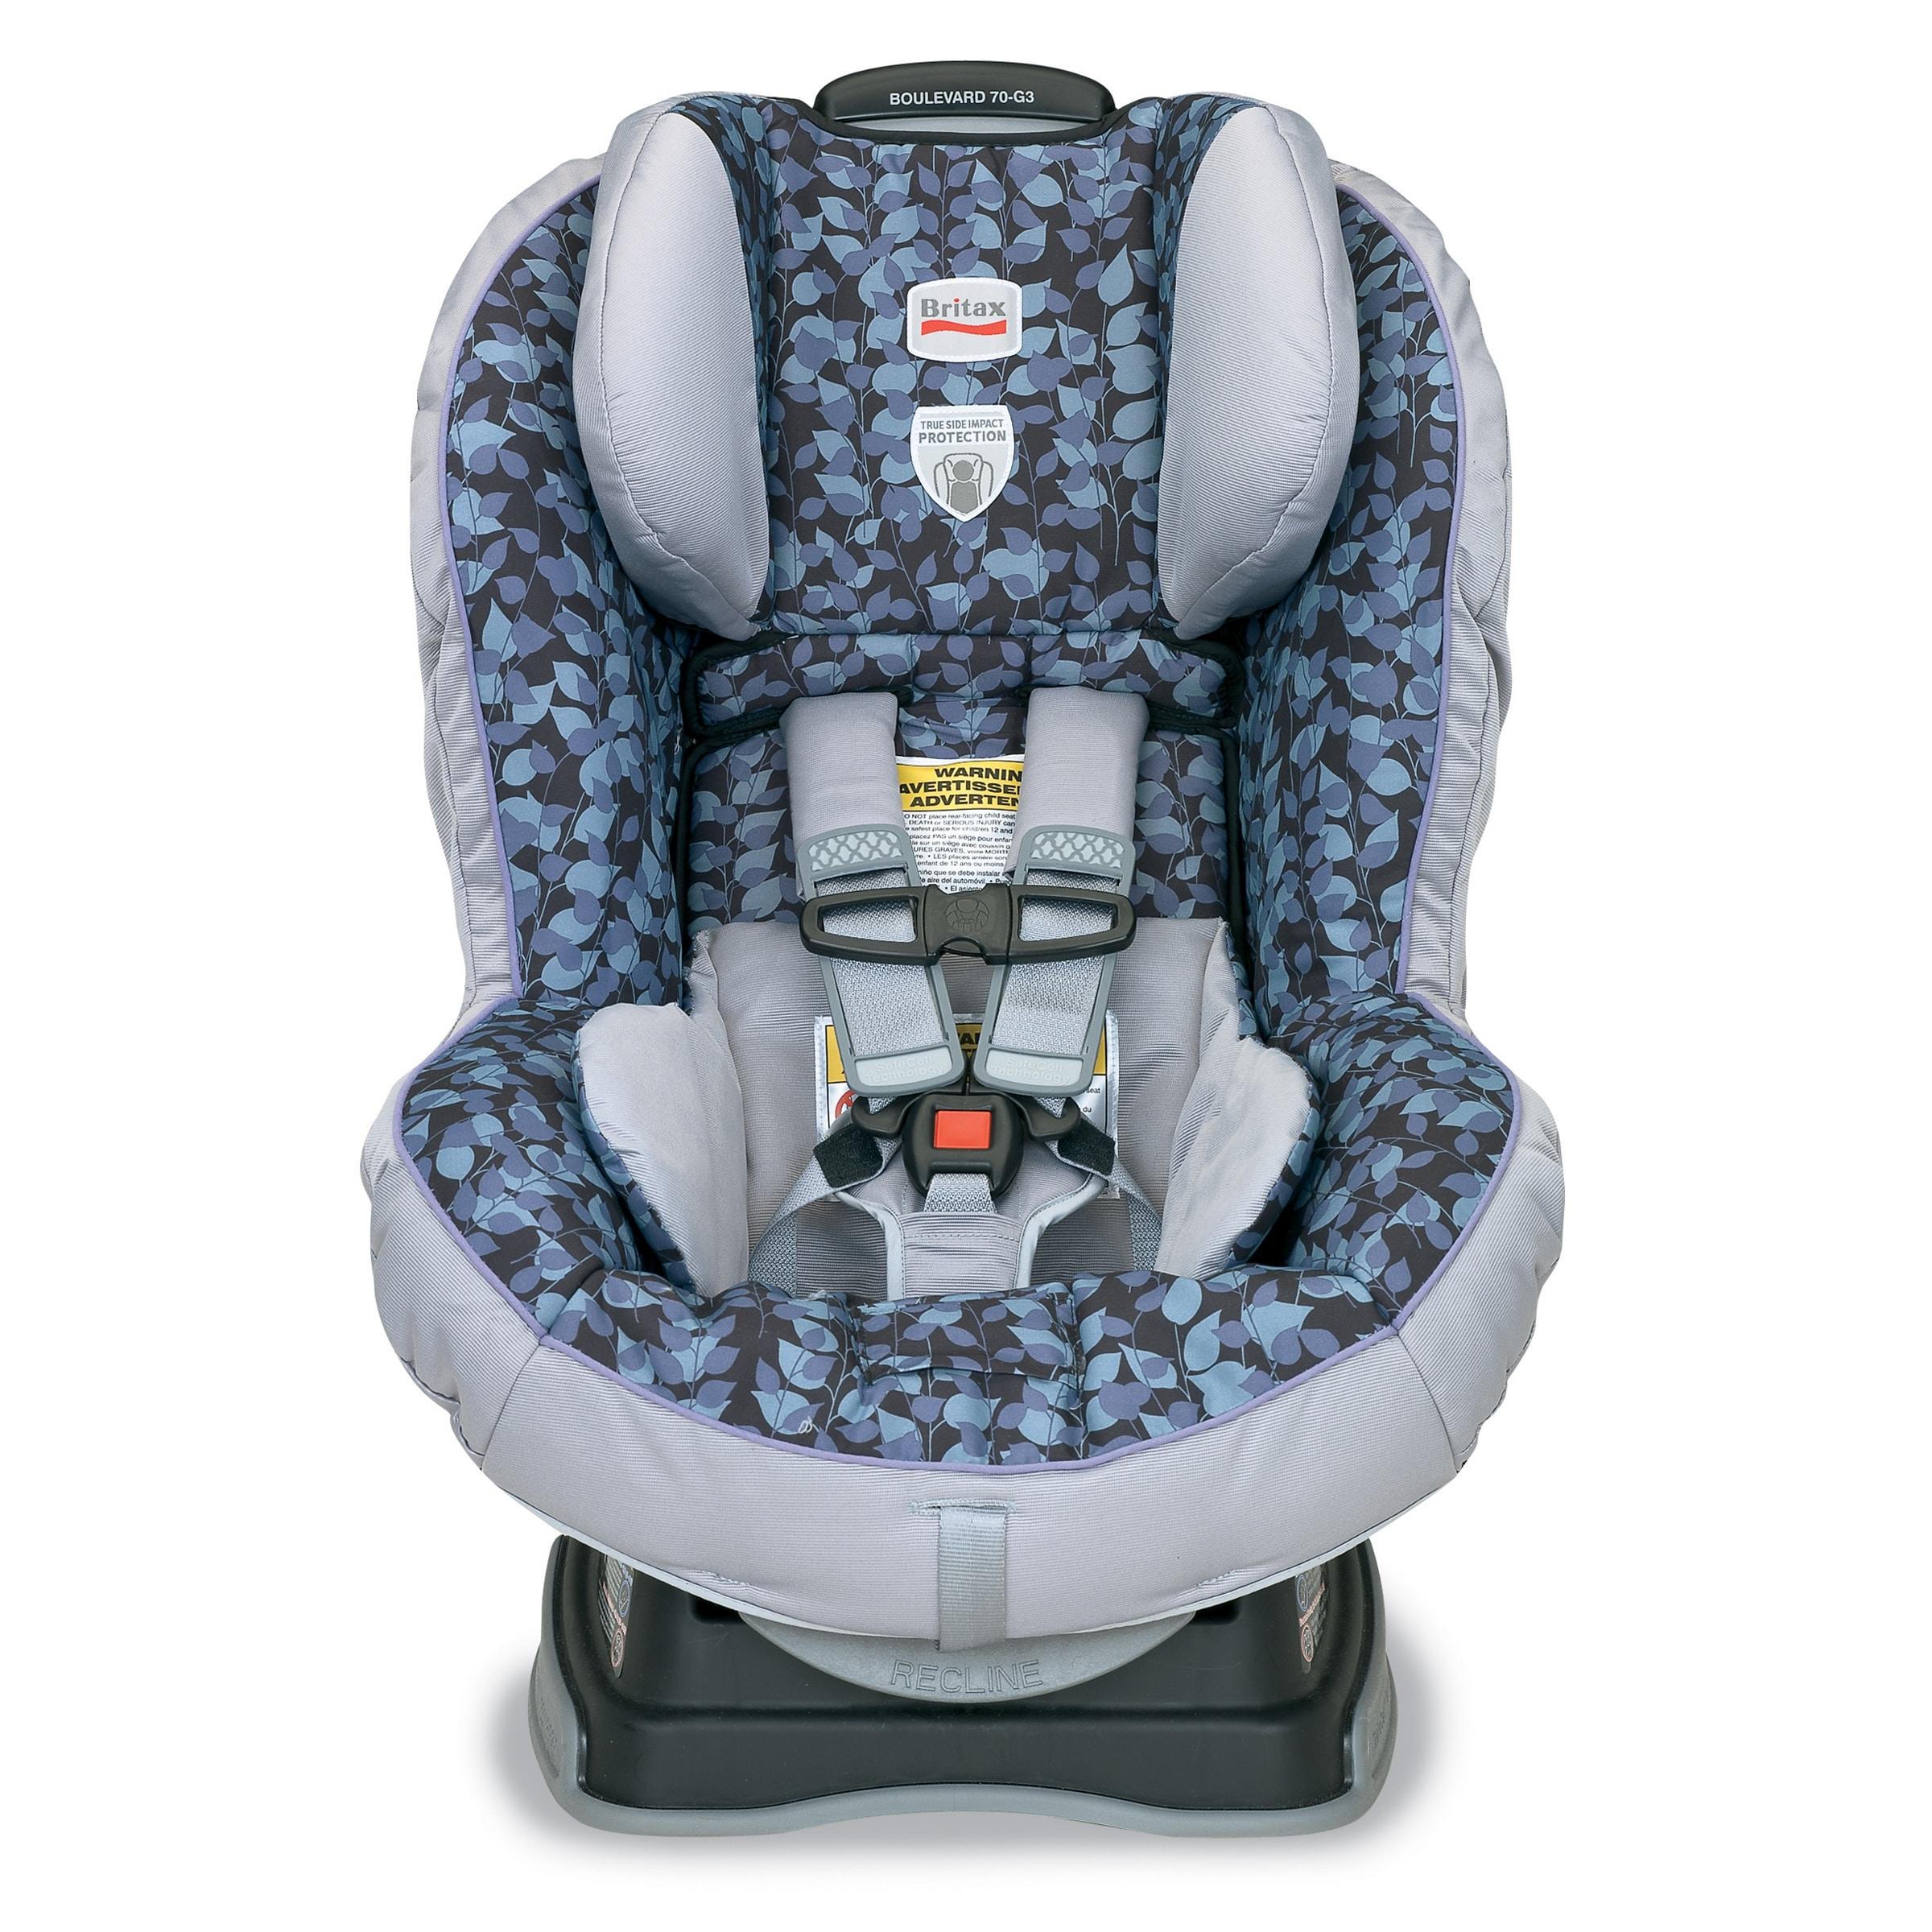 Britax Boulevard 70-G3 Convertible Car Seat in Caitlin